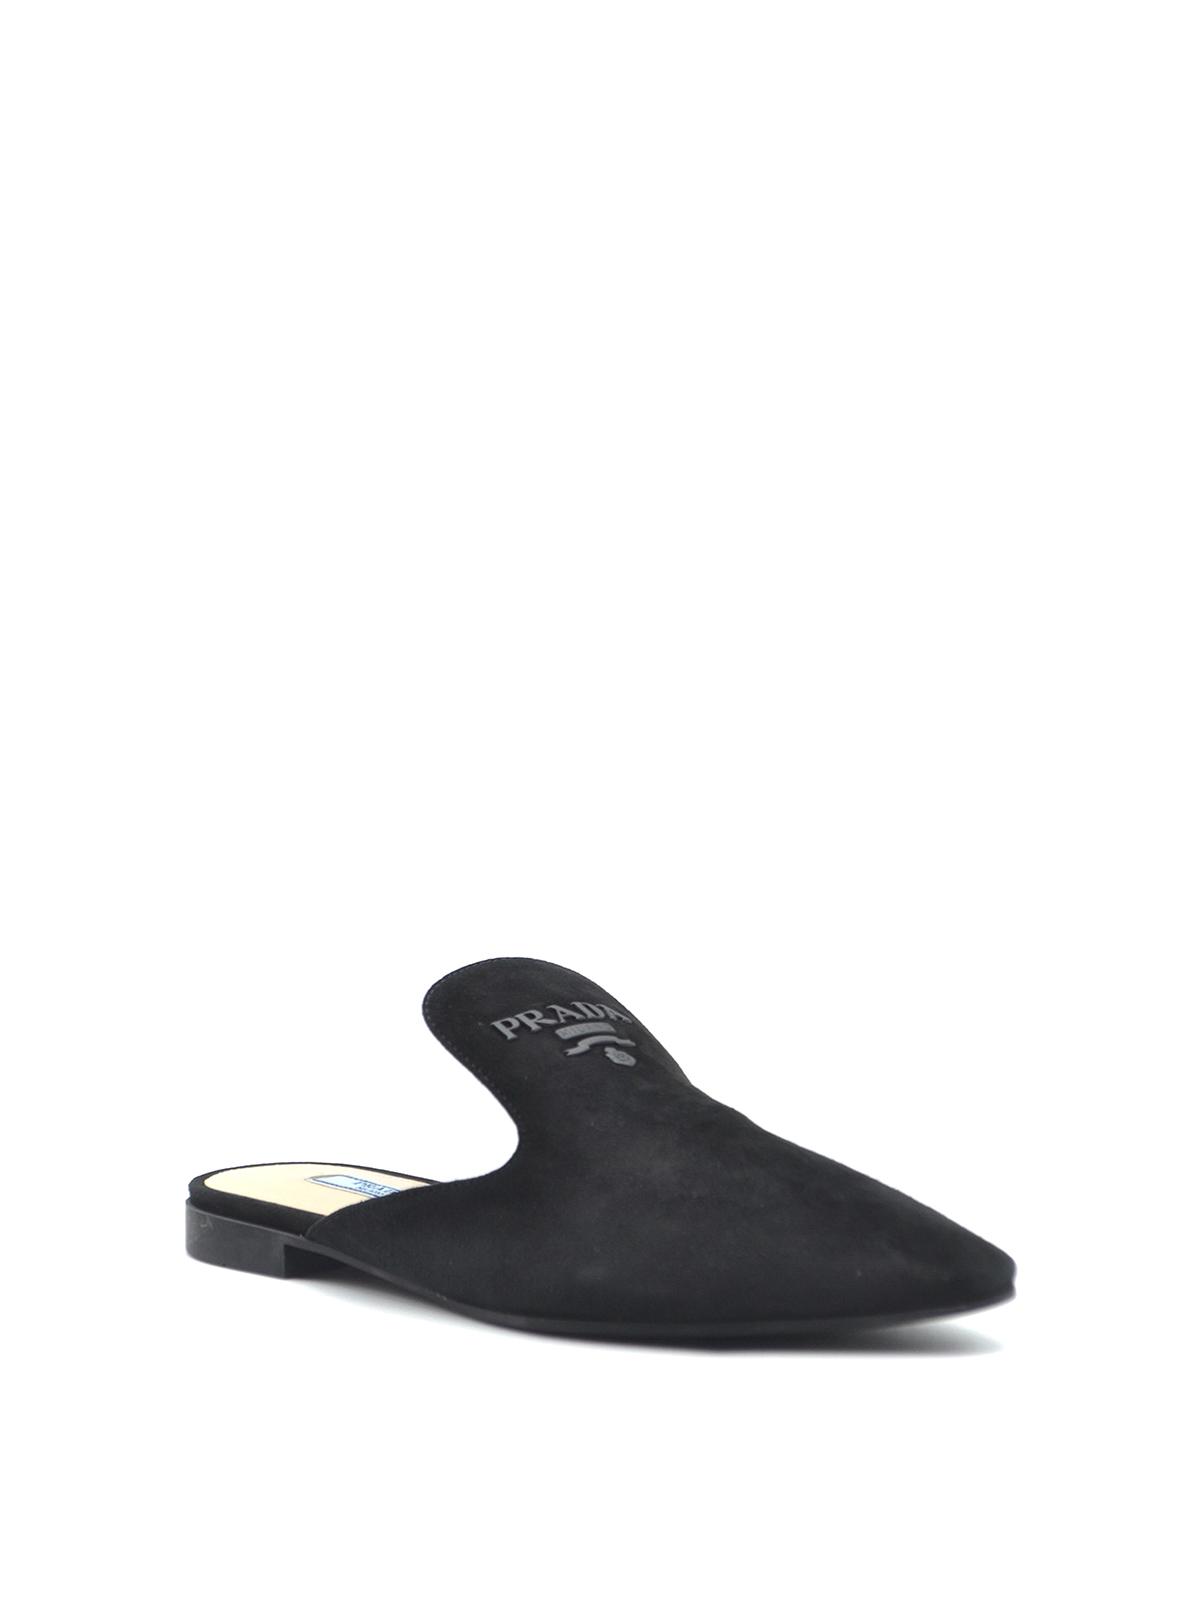 Prada - Black suede mules - صندل میول